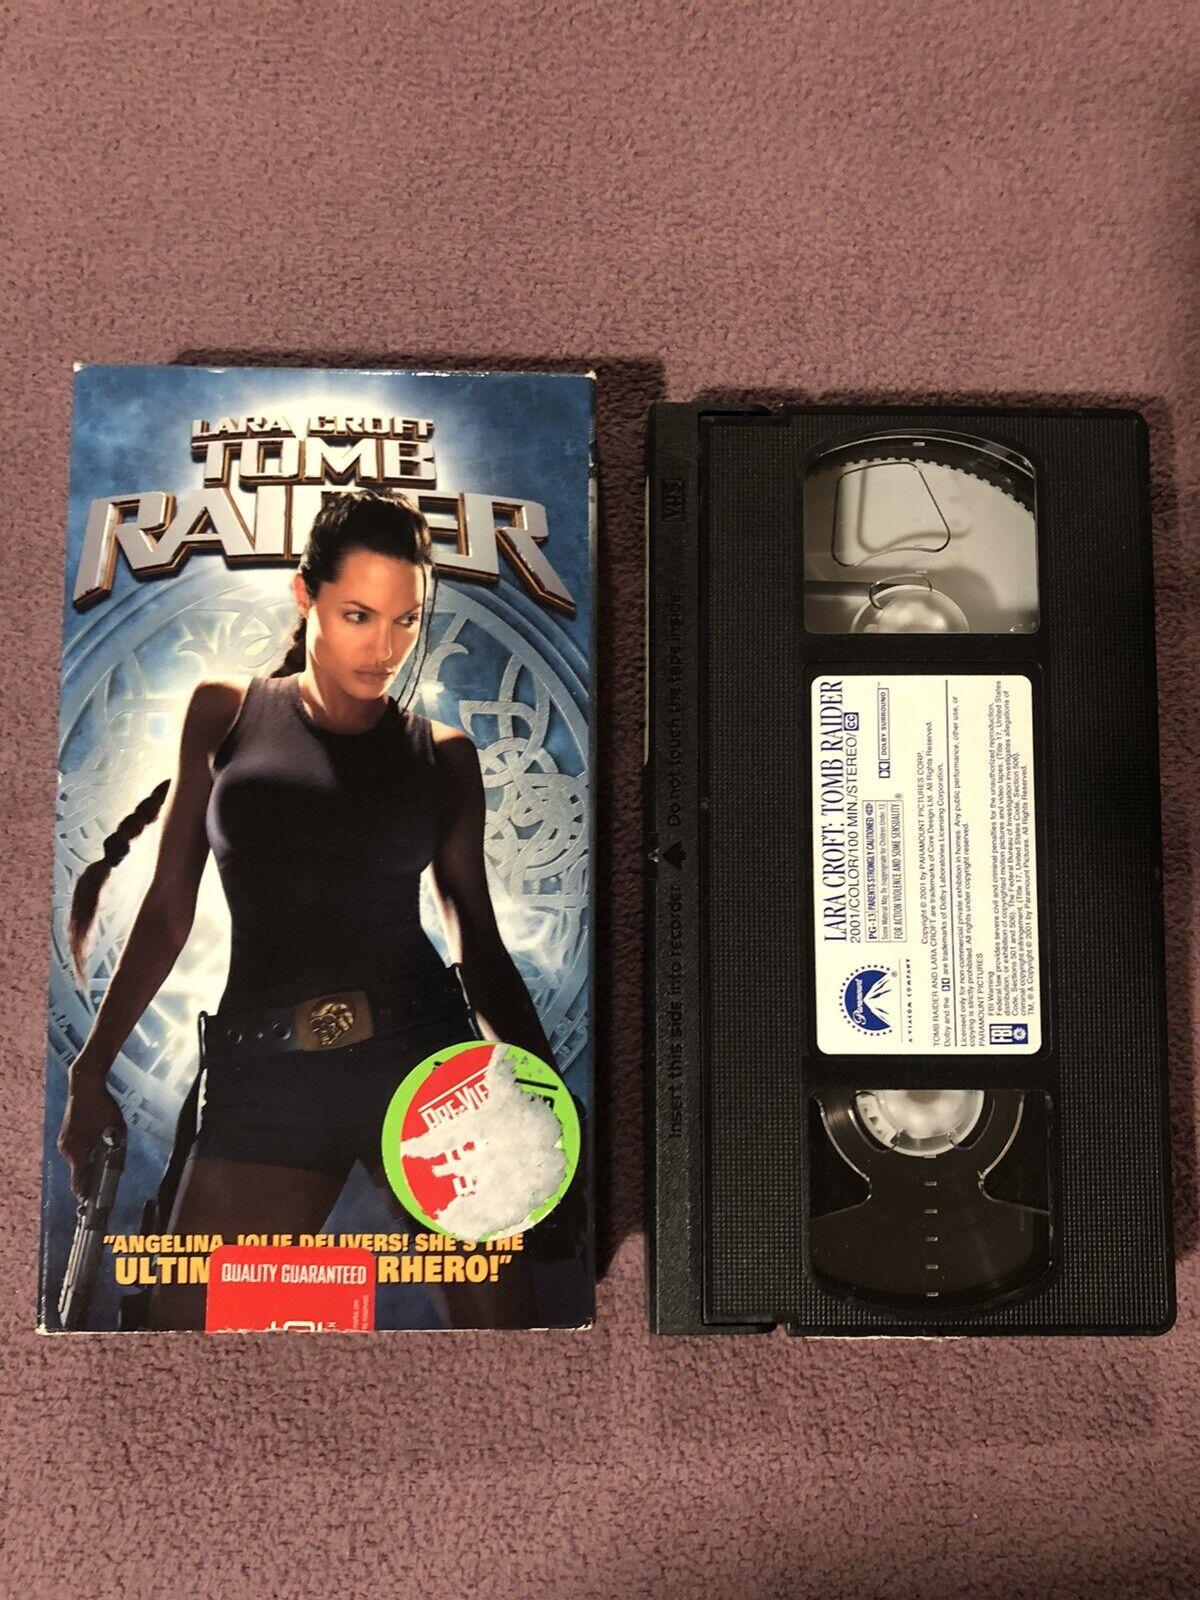 Lara Croft Tomb Raider Vhs 2001 For Sale Online Ebay